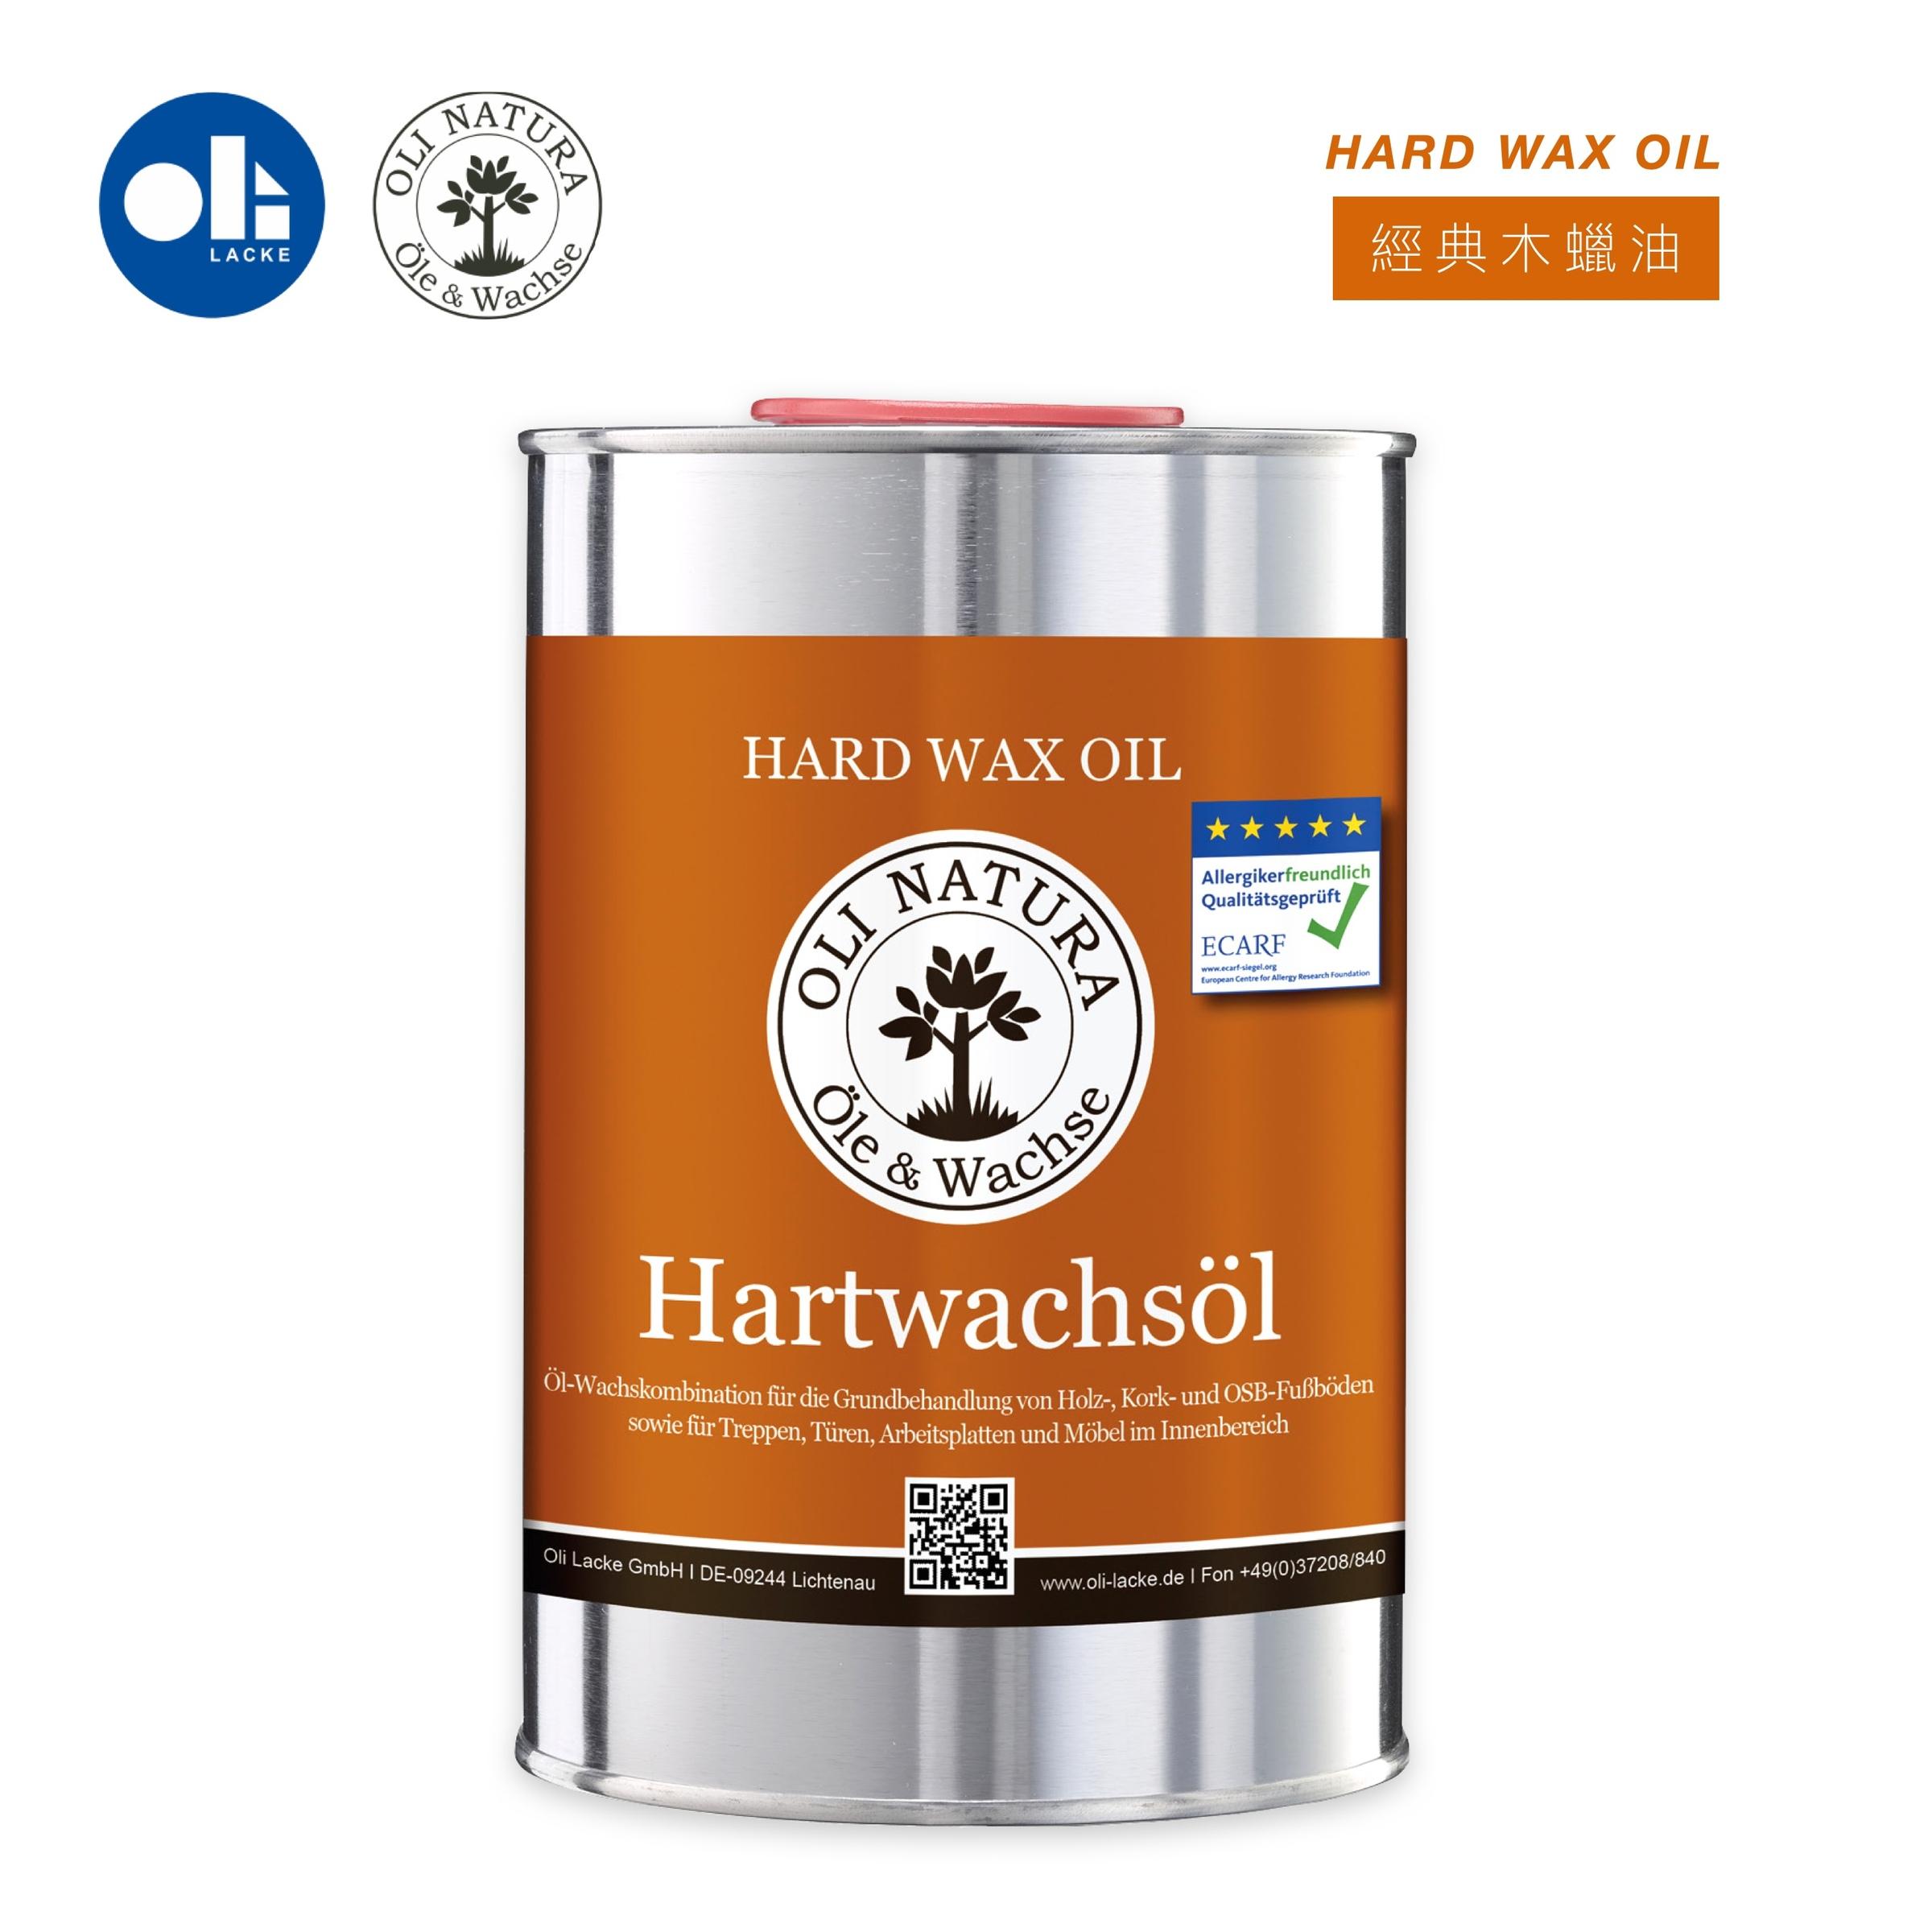 OLI-LACKE hardwax oil.jpg